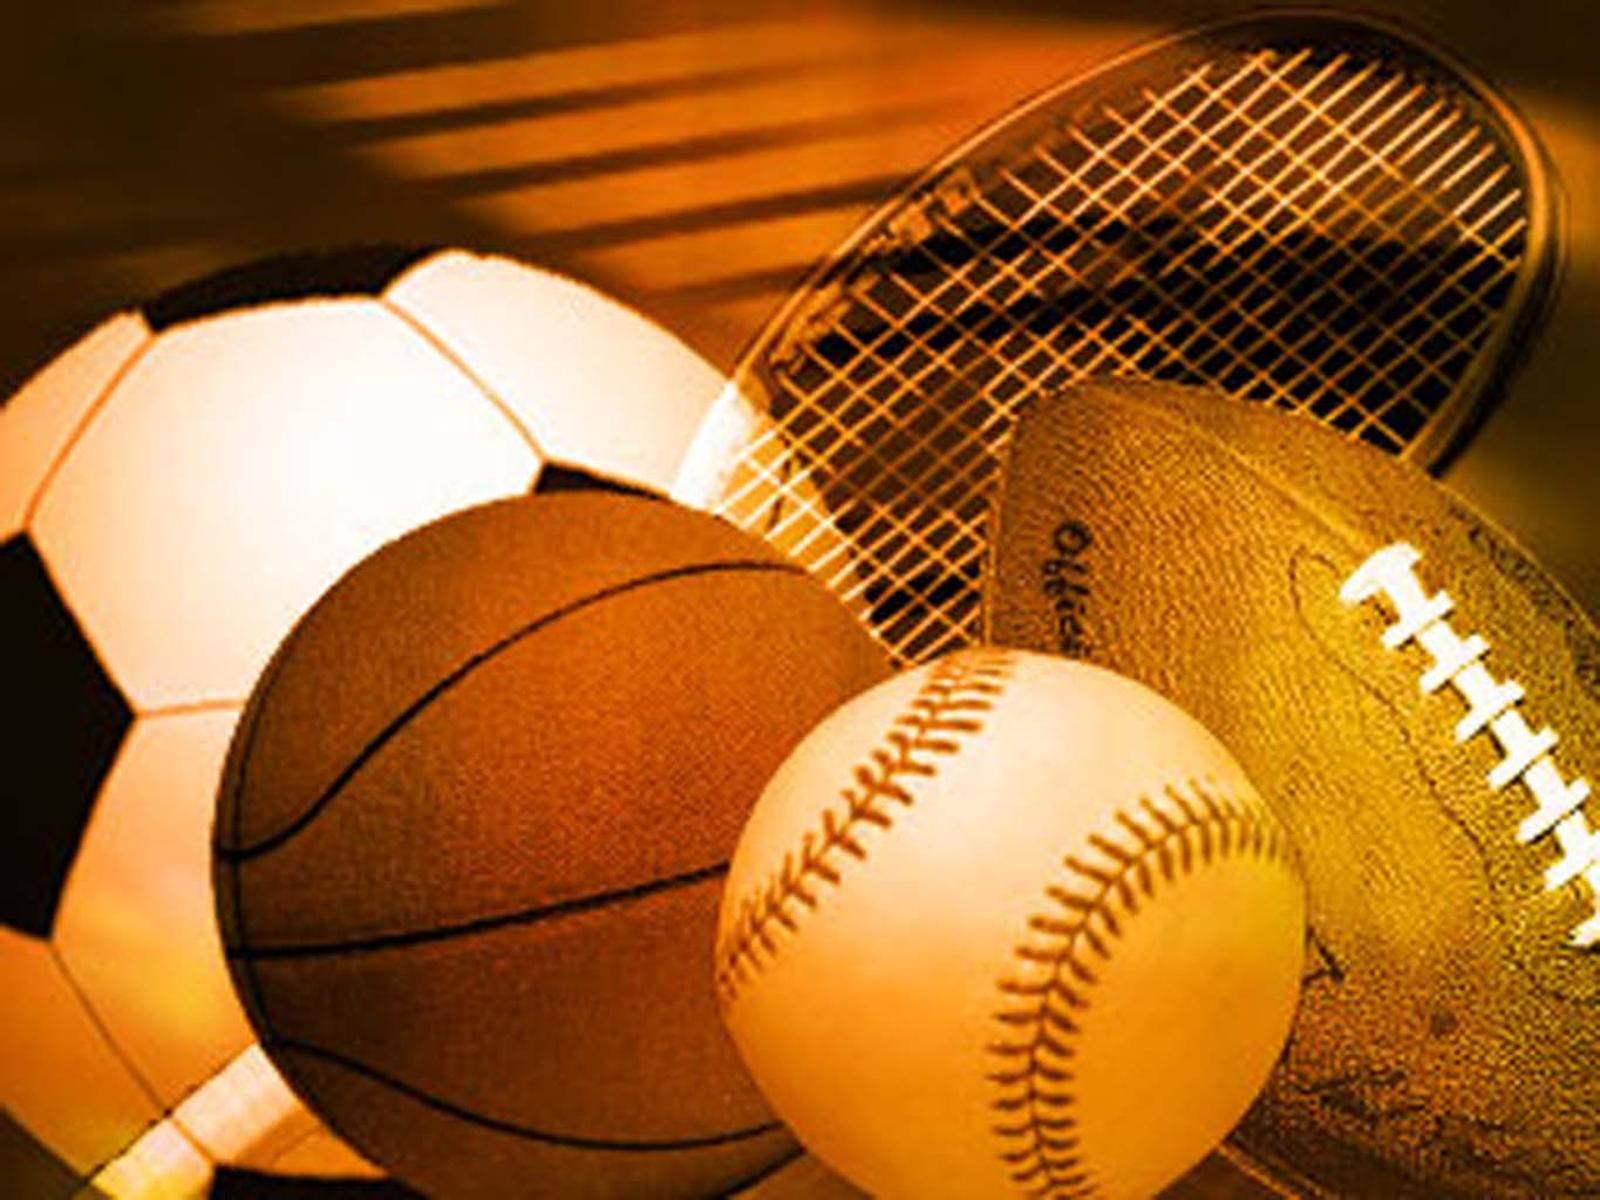 Free Sports Backgrounds - WallpaperSafari